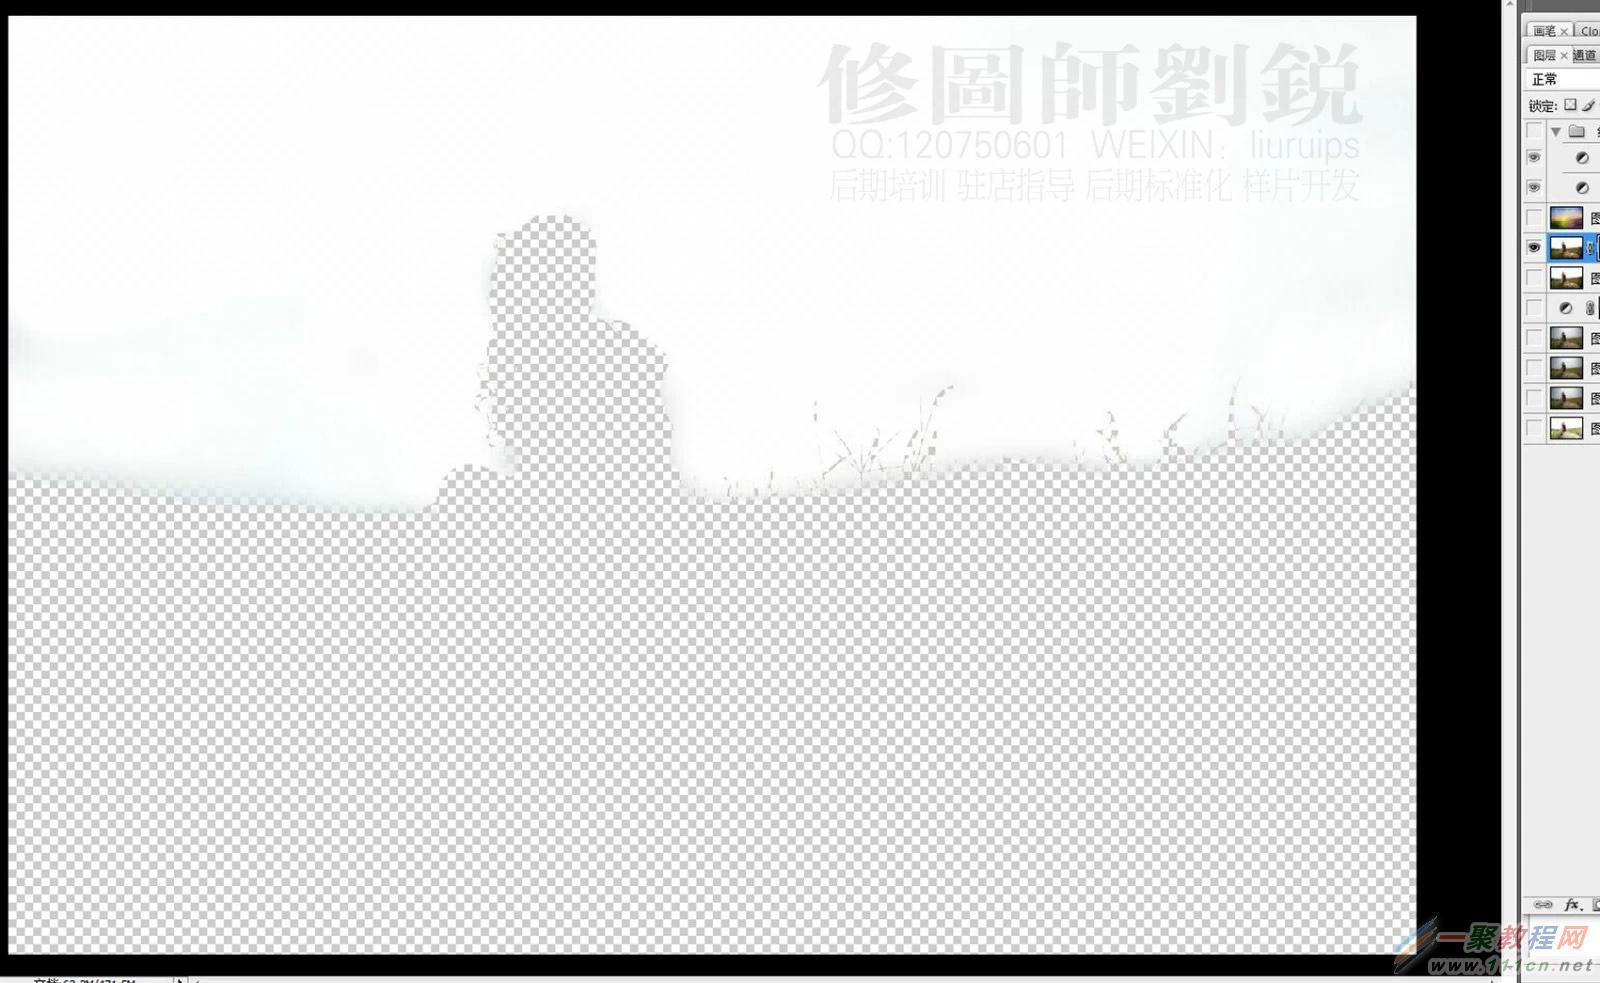 ppt 背景 背景图片 边框 模板 设计 矢量 矢量图 素材 相框 1600_983